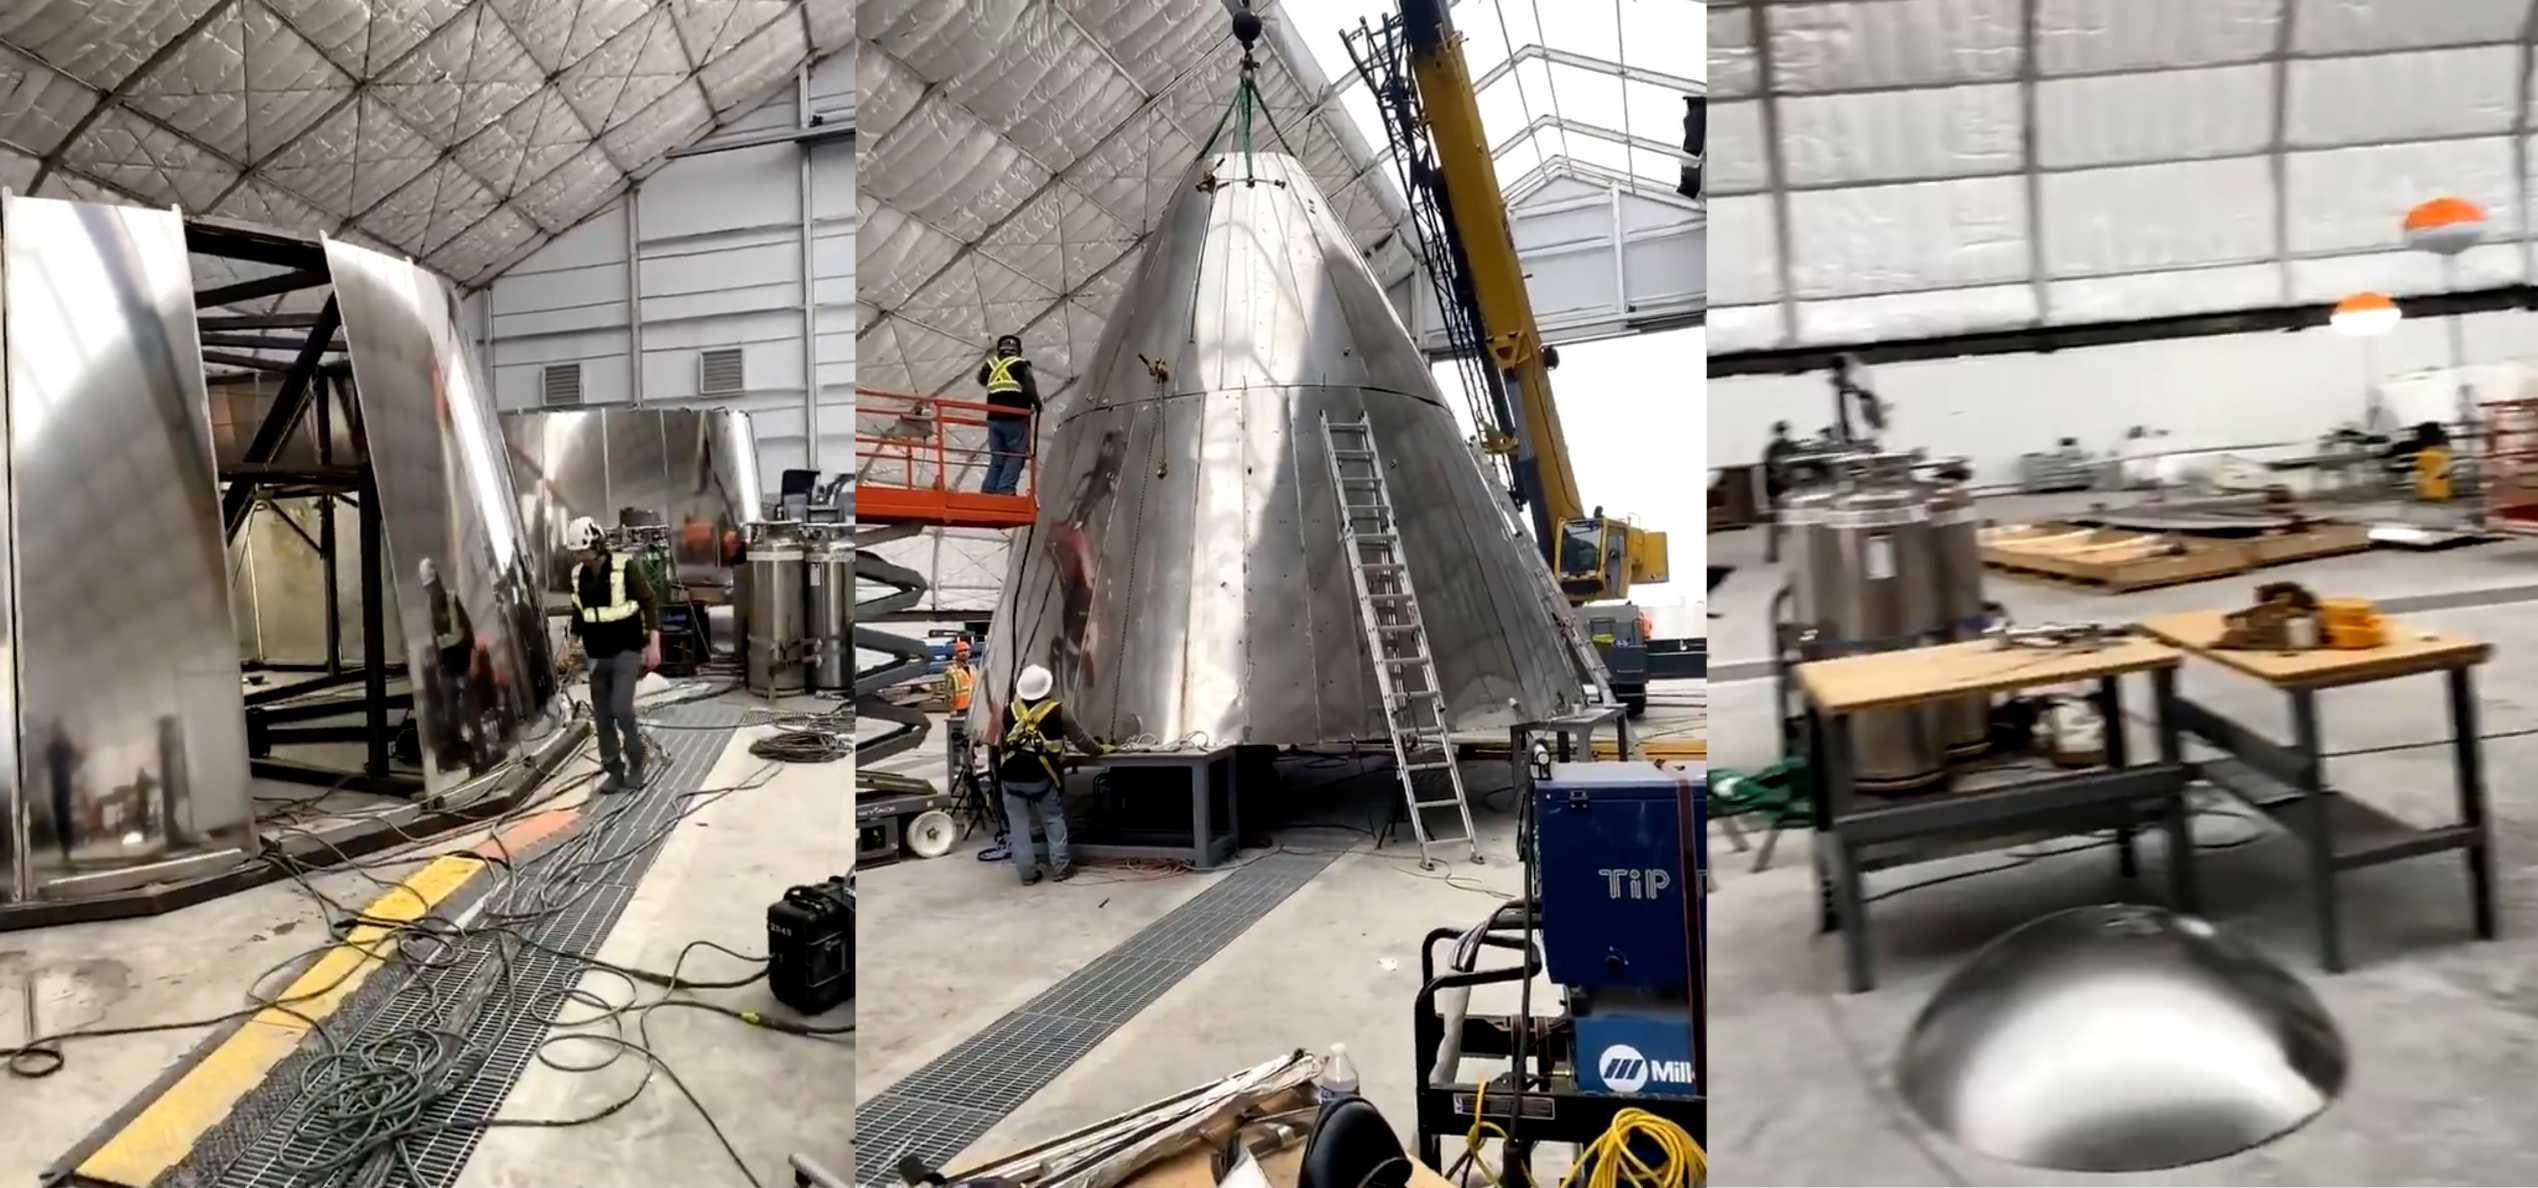 Starship nosecone production tent 021920 (Elon Musk) SN01 mosaic 2 (c)